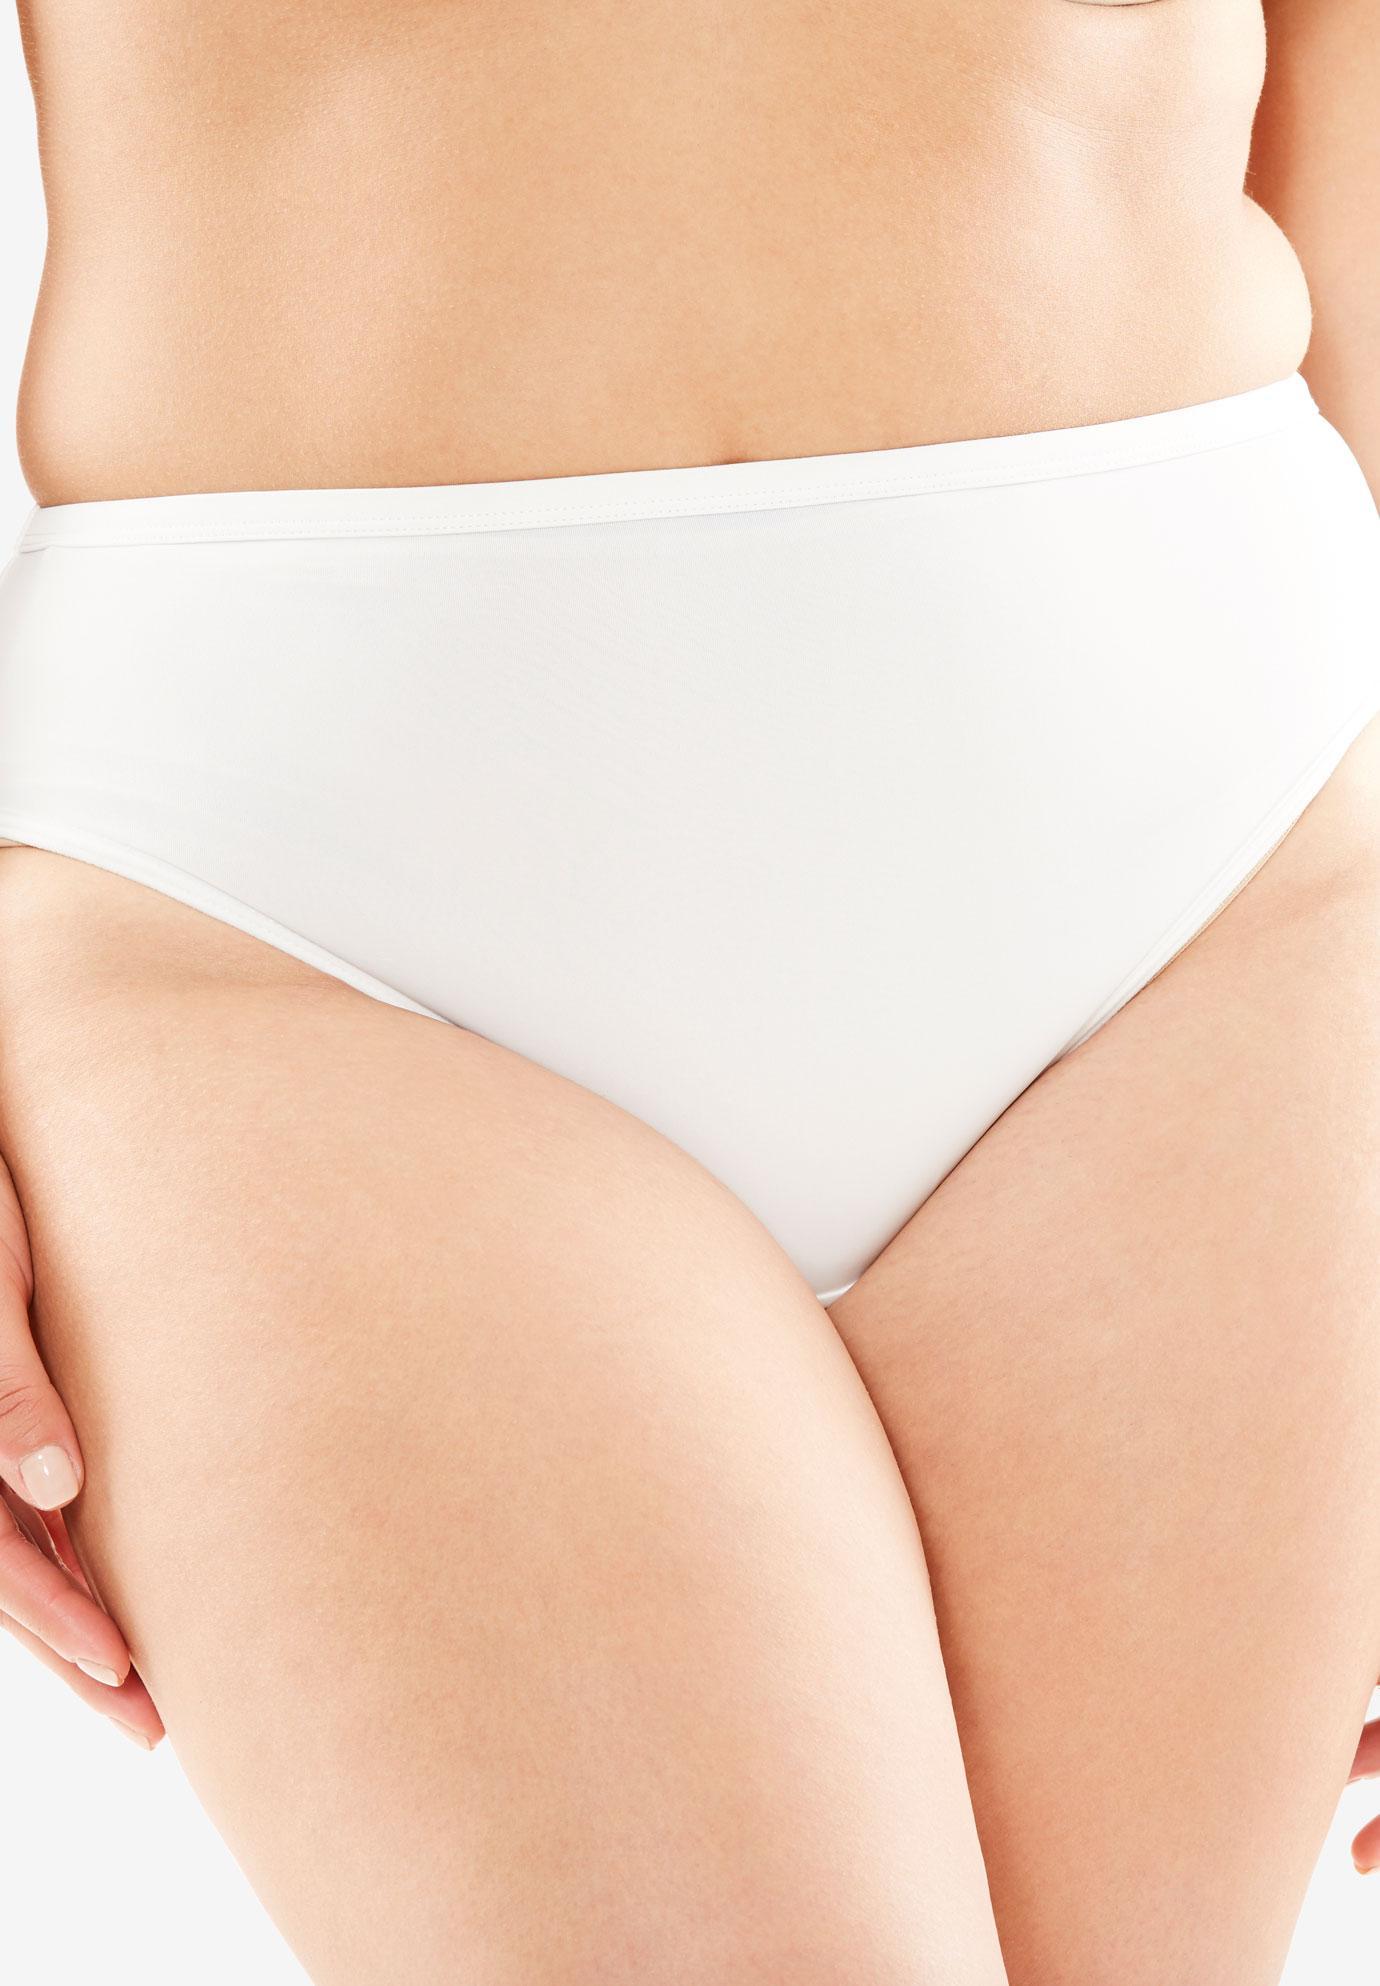 36d453a761 Microfiber Bikini Panty by Comfort Choice®